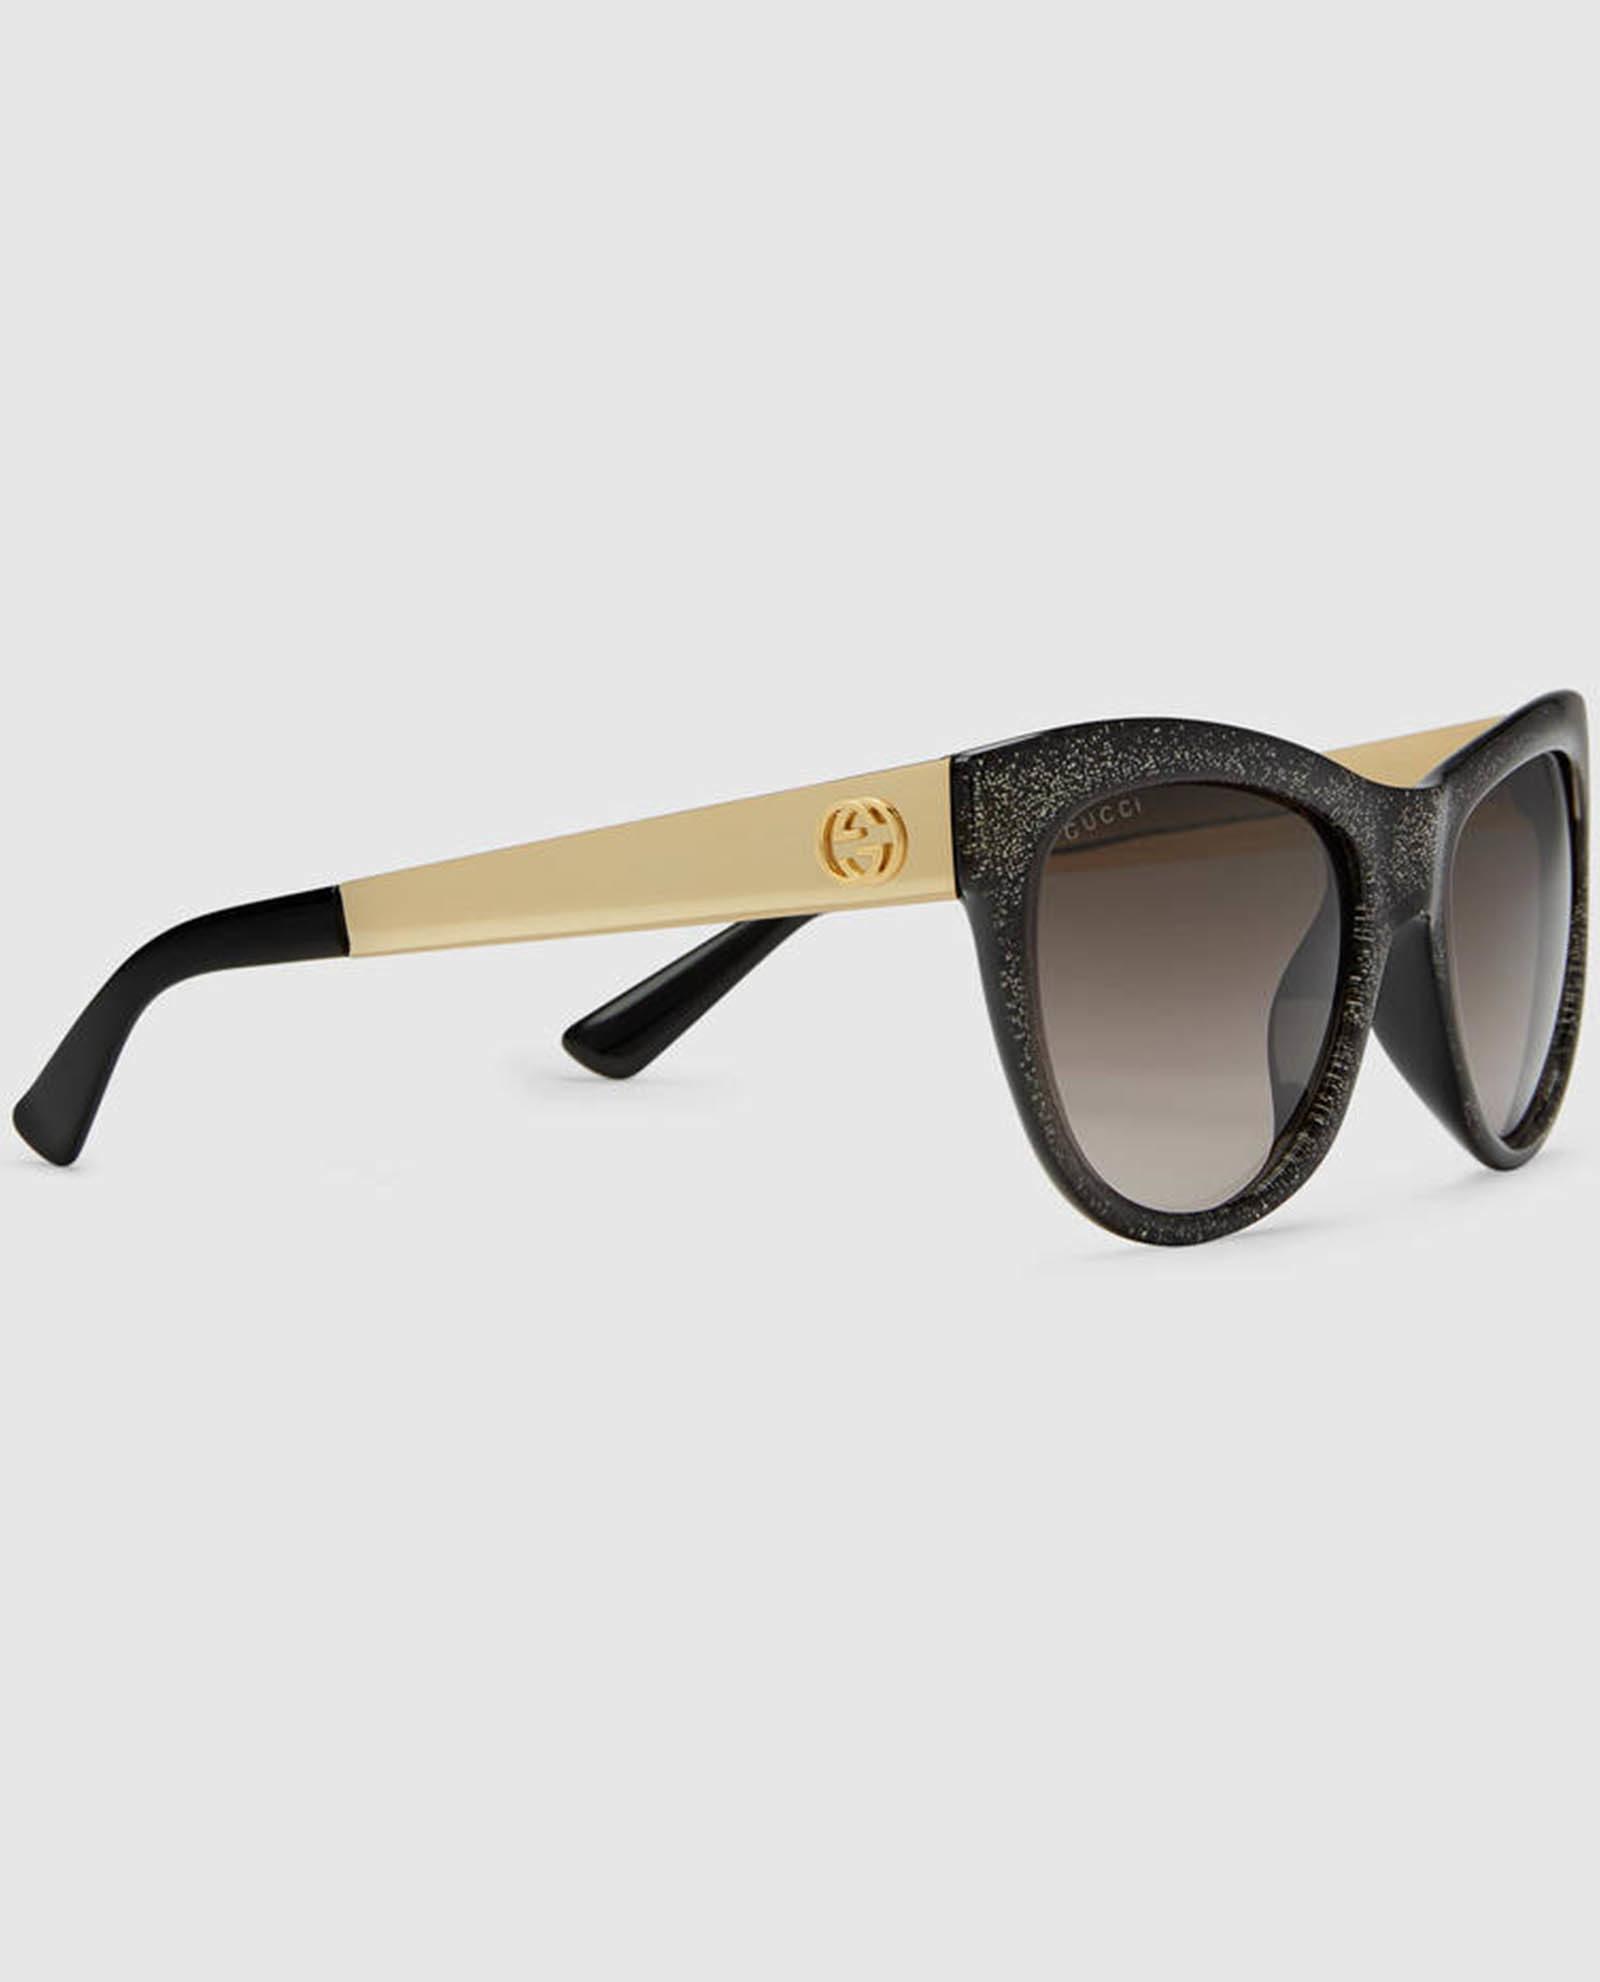 https://www.polydoruoptika.gr/wp-content/uploads/2018/03/434045_J1350_8582_002_100_0000_Light-Cat-eye-glitter-sunglasses-GUCCI-WOMAN.jpg